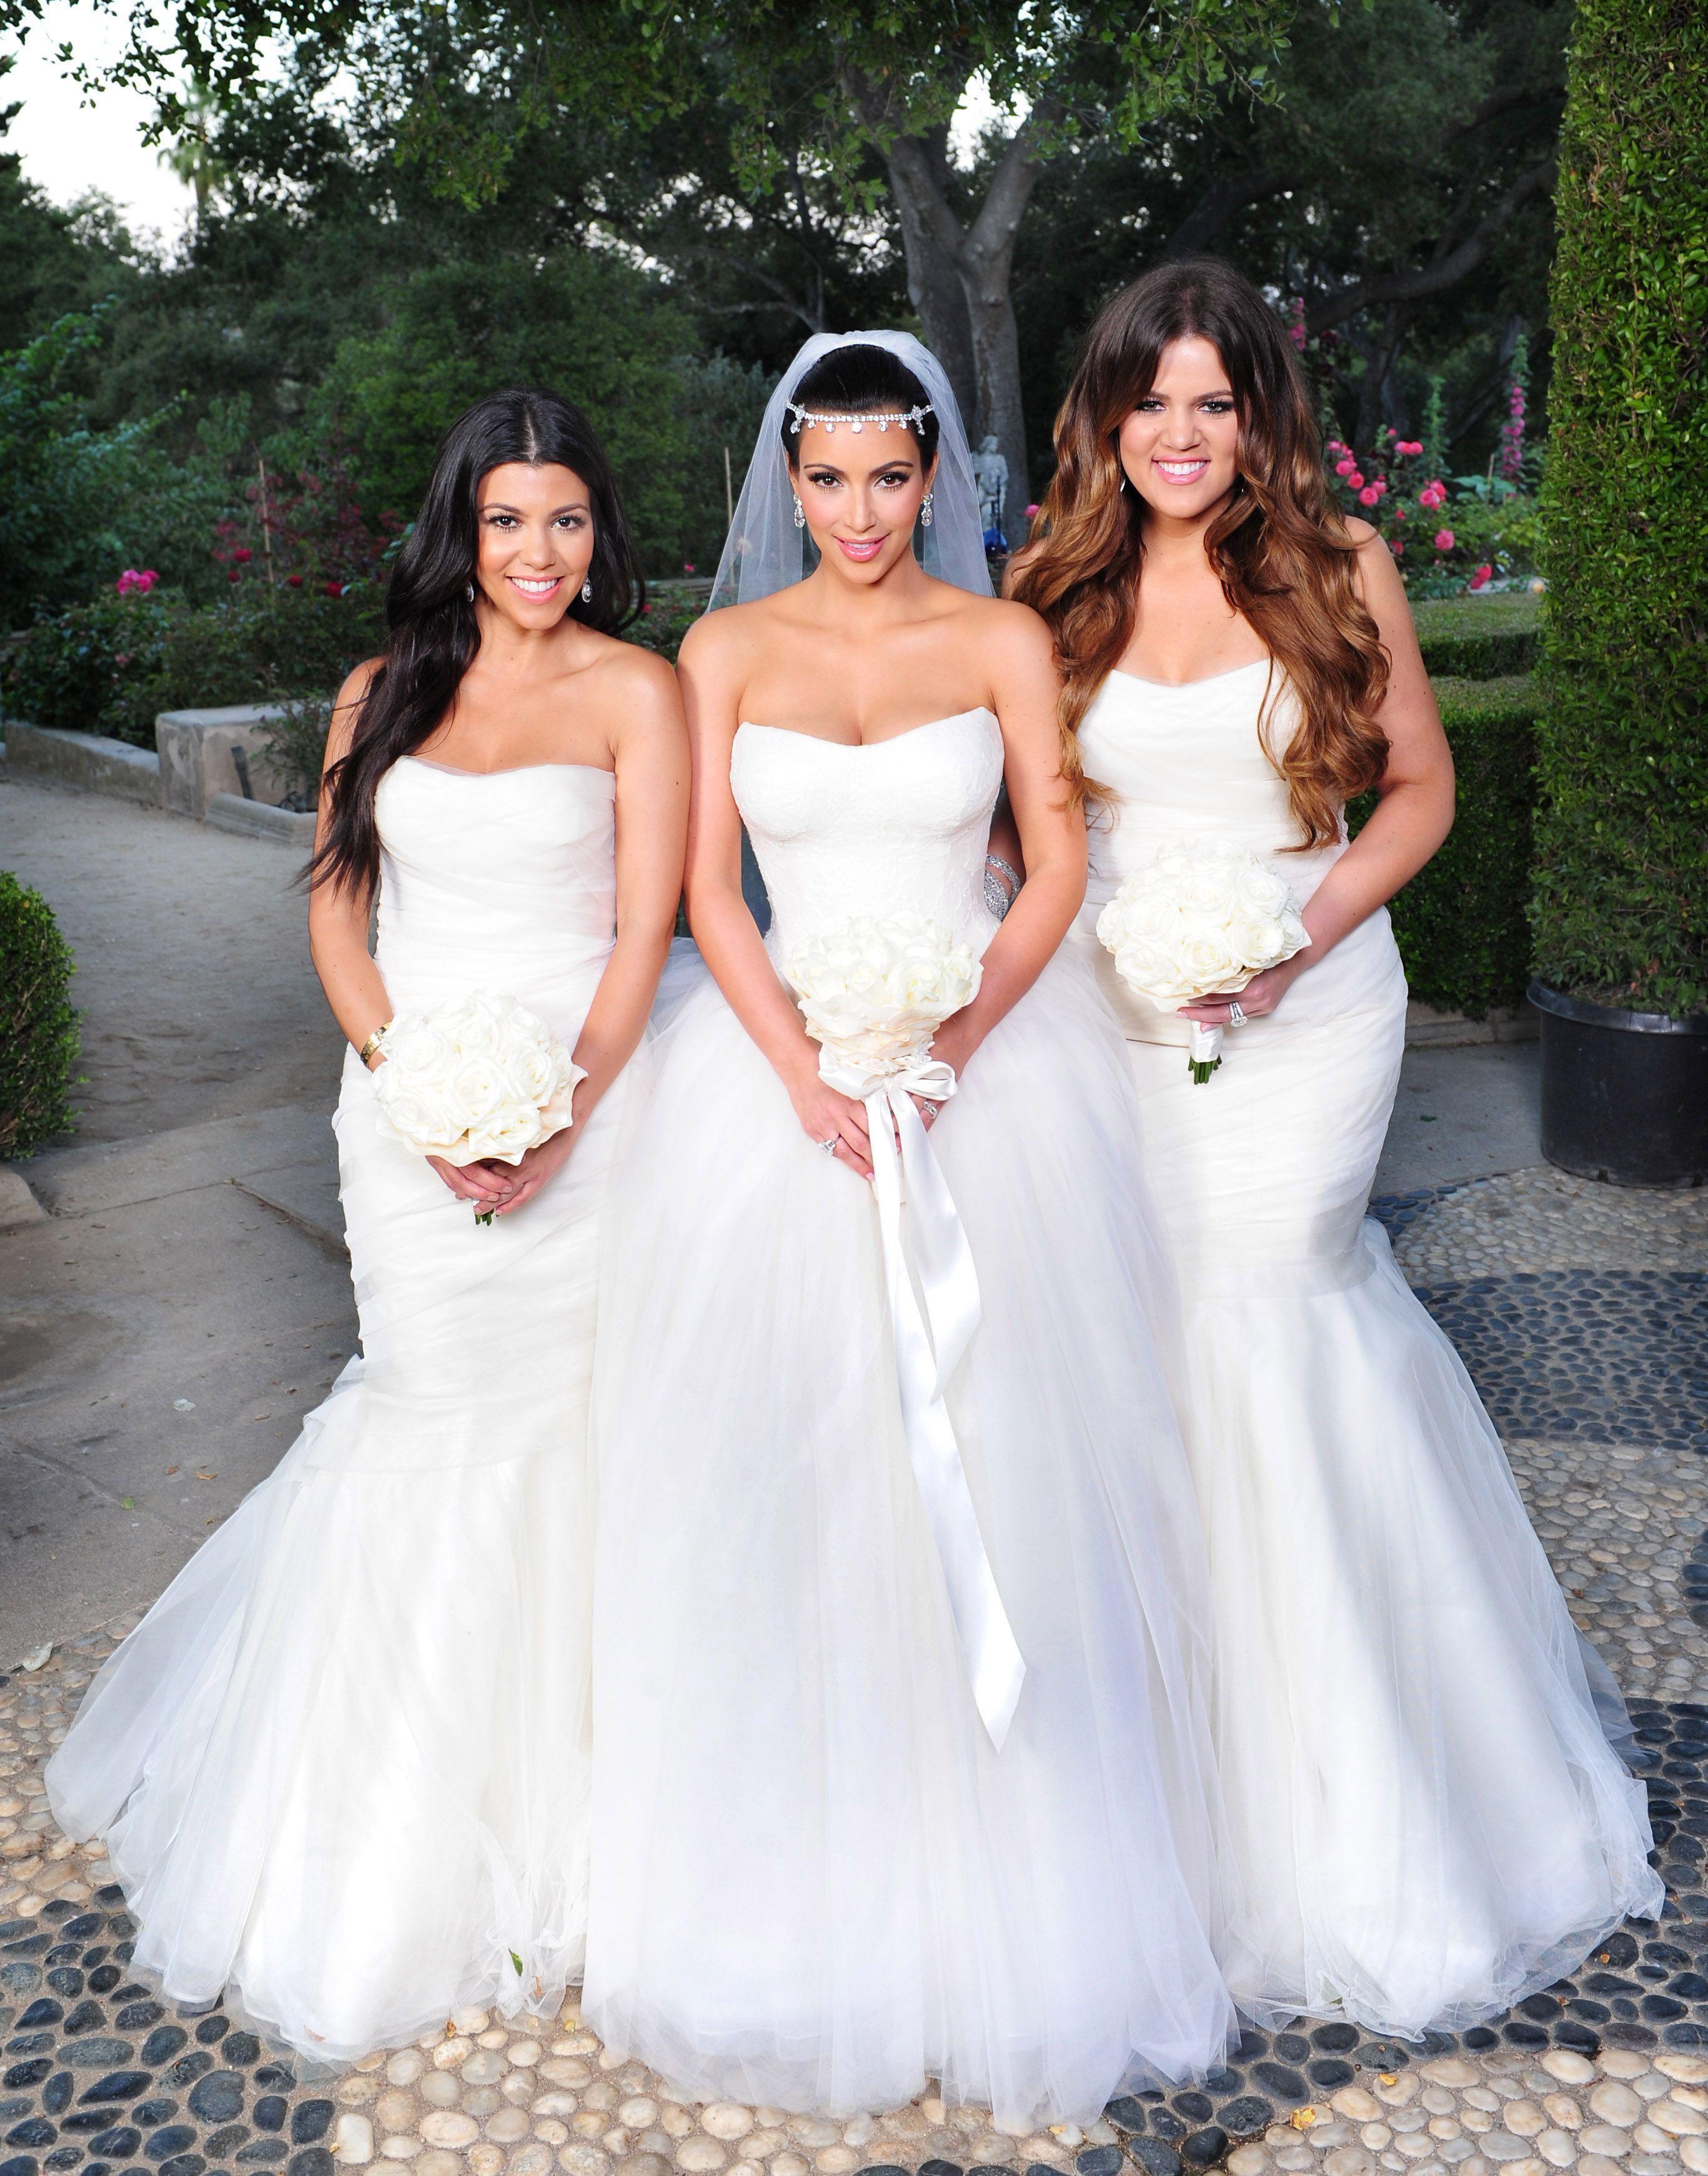 41+ Coiffure mariage kim kardashian le dernier